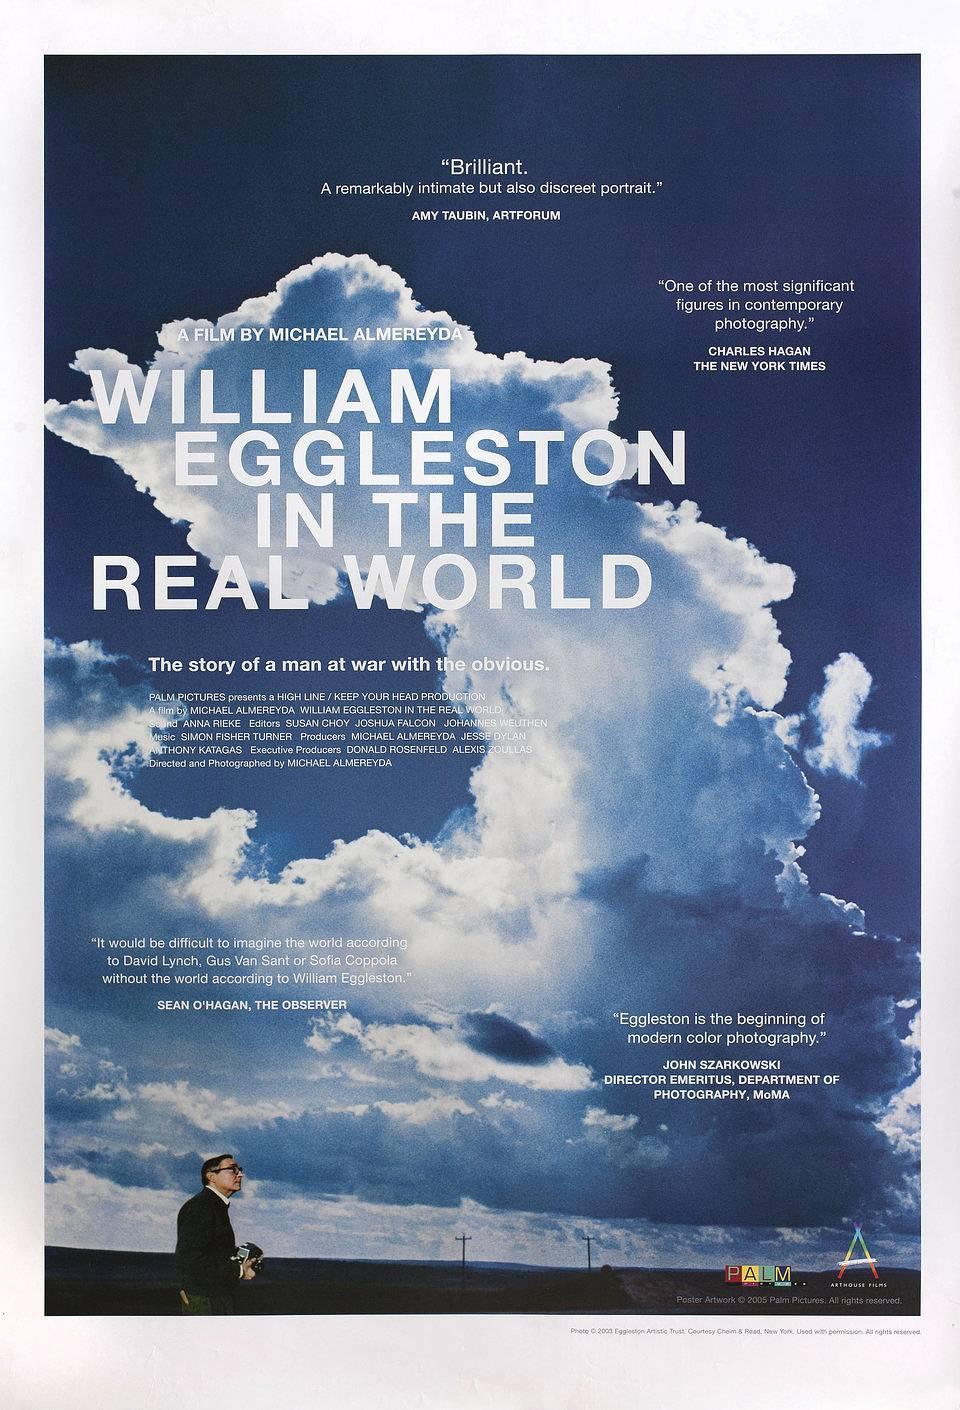 William Eggleston In the Real World, assista o documentário - DXfoto